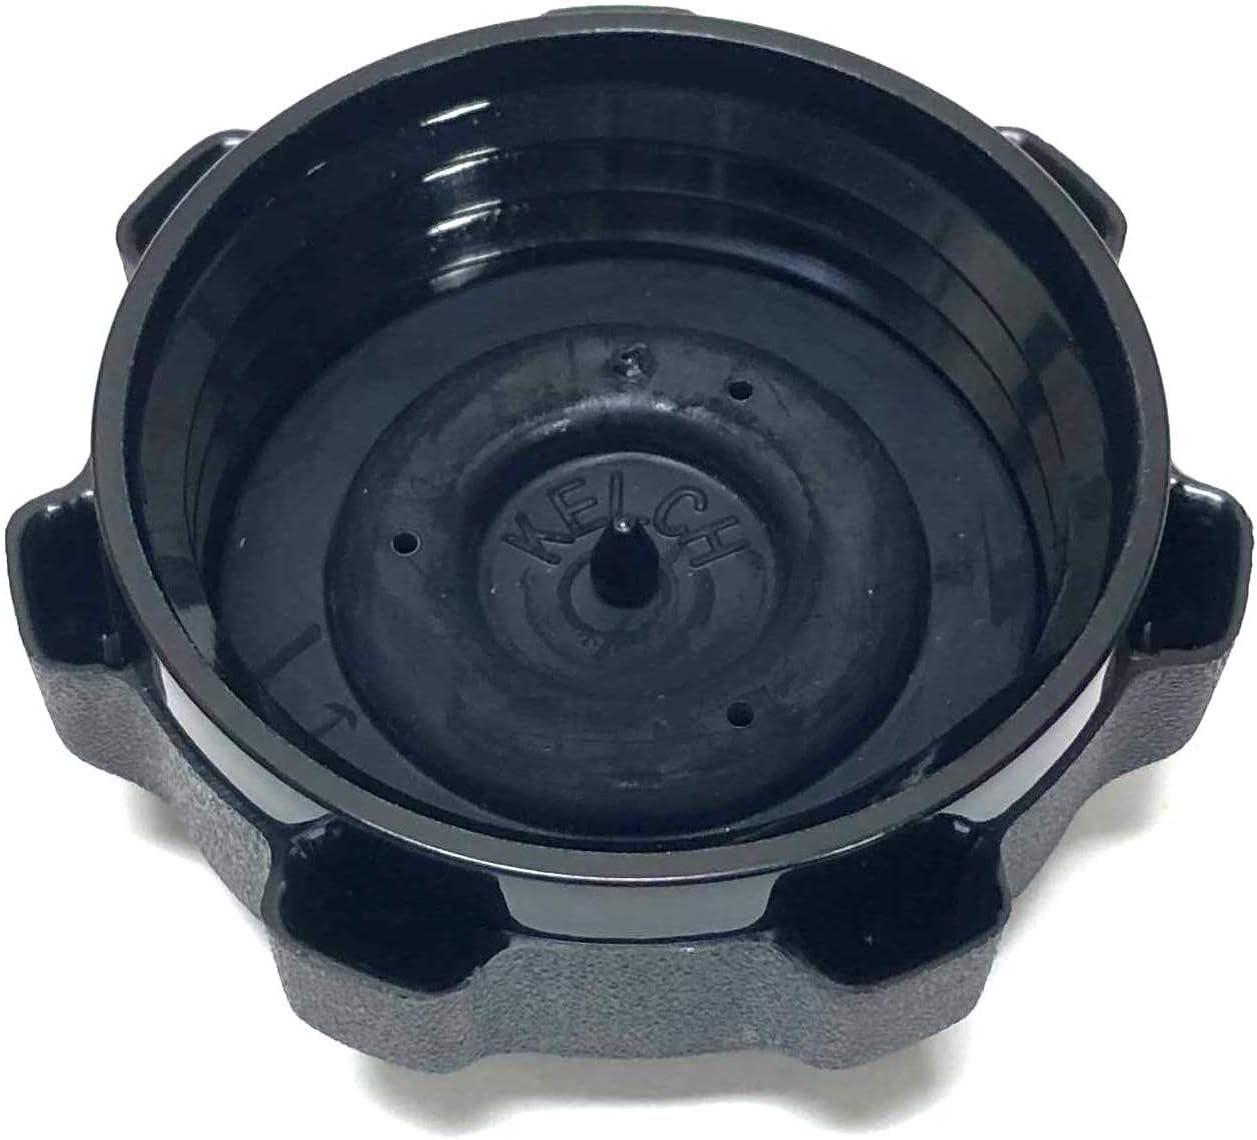 Briggs and Stratton Intek Pro Fuel Cap 795027 Genuine Part